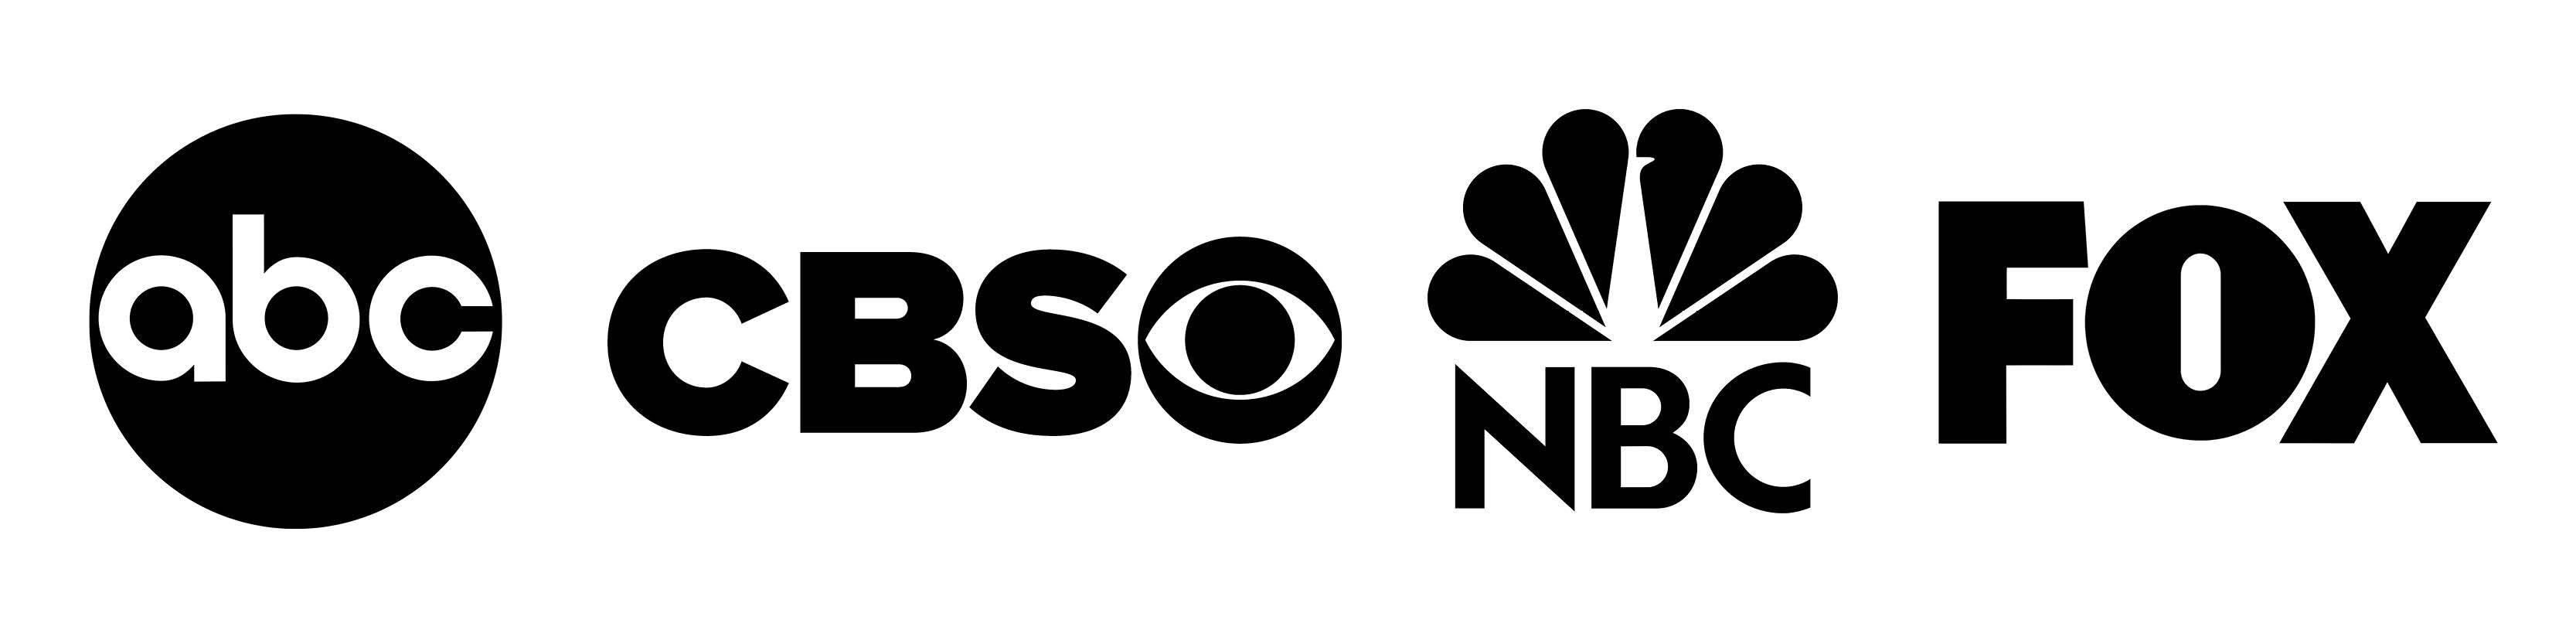 Major News Network Logos